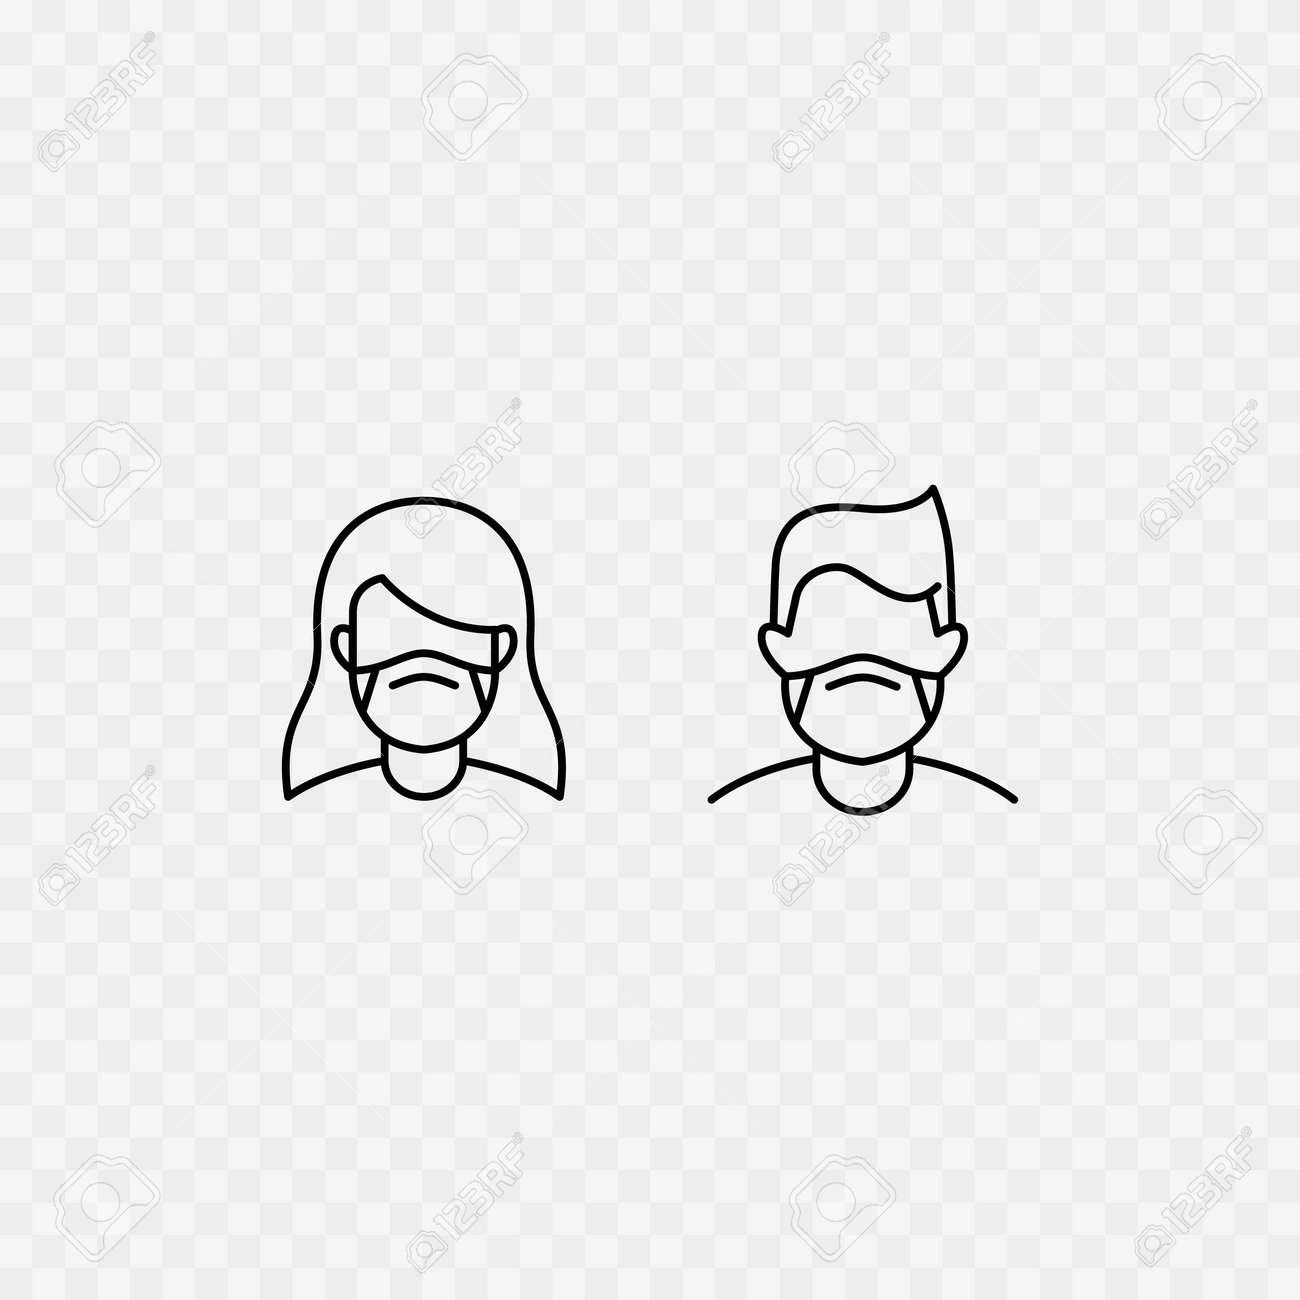 Medical mask. Face mask. Coronavirus protection. Line icons. Vector - 152125897